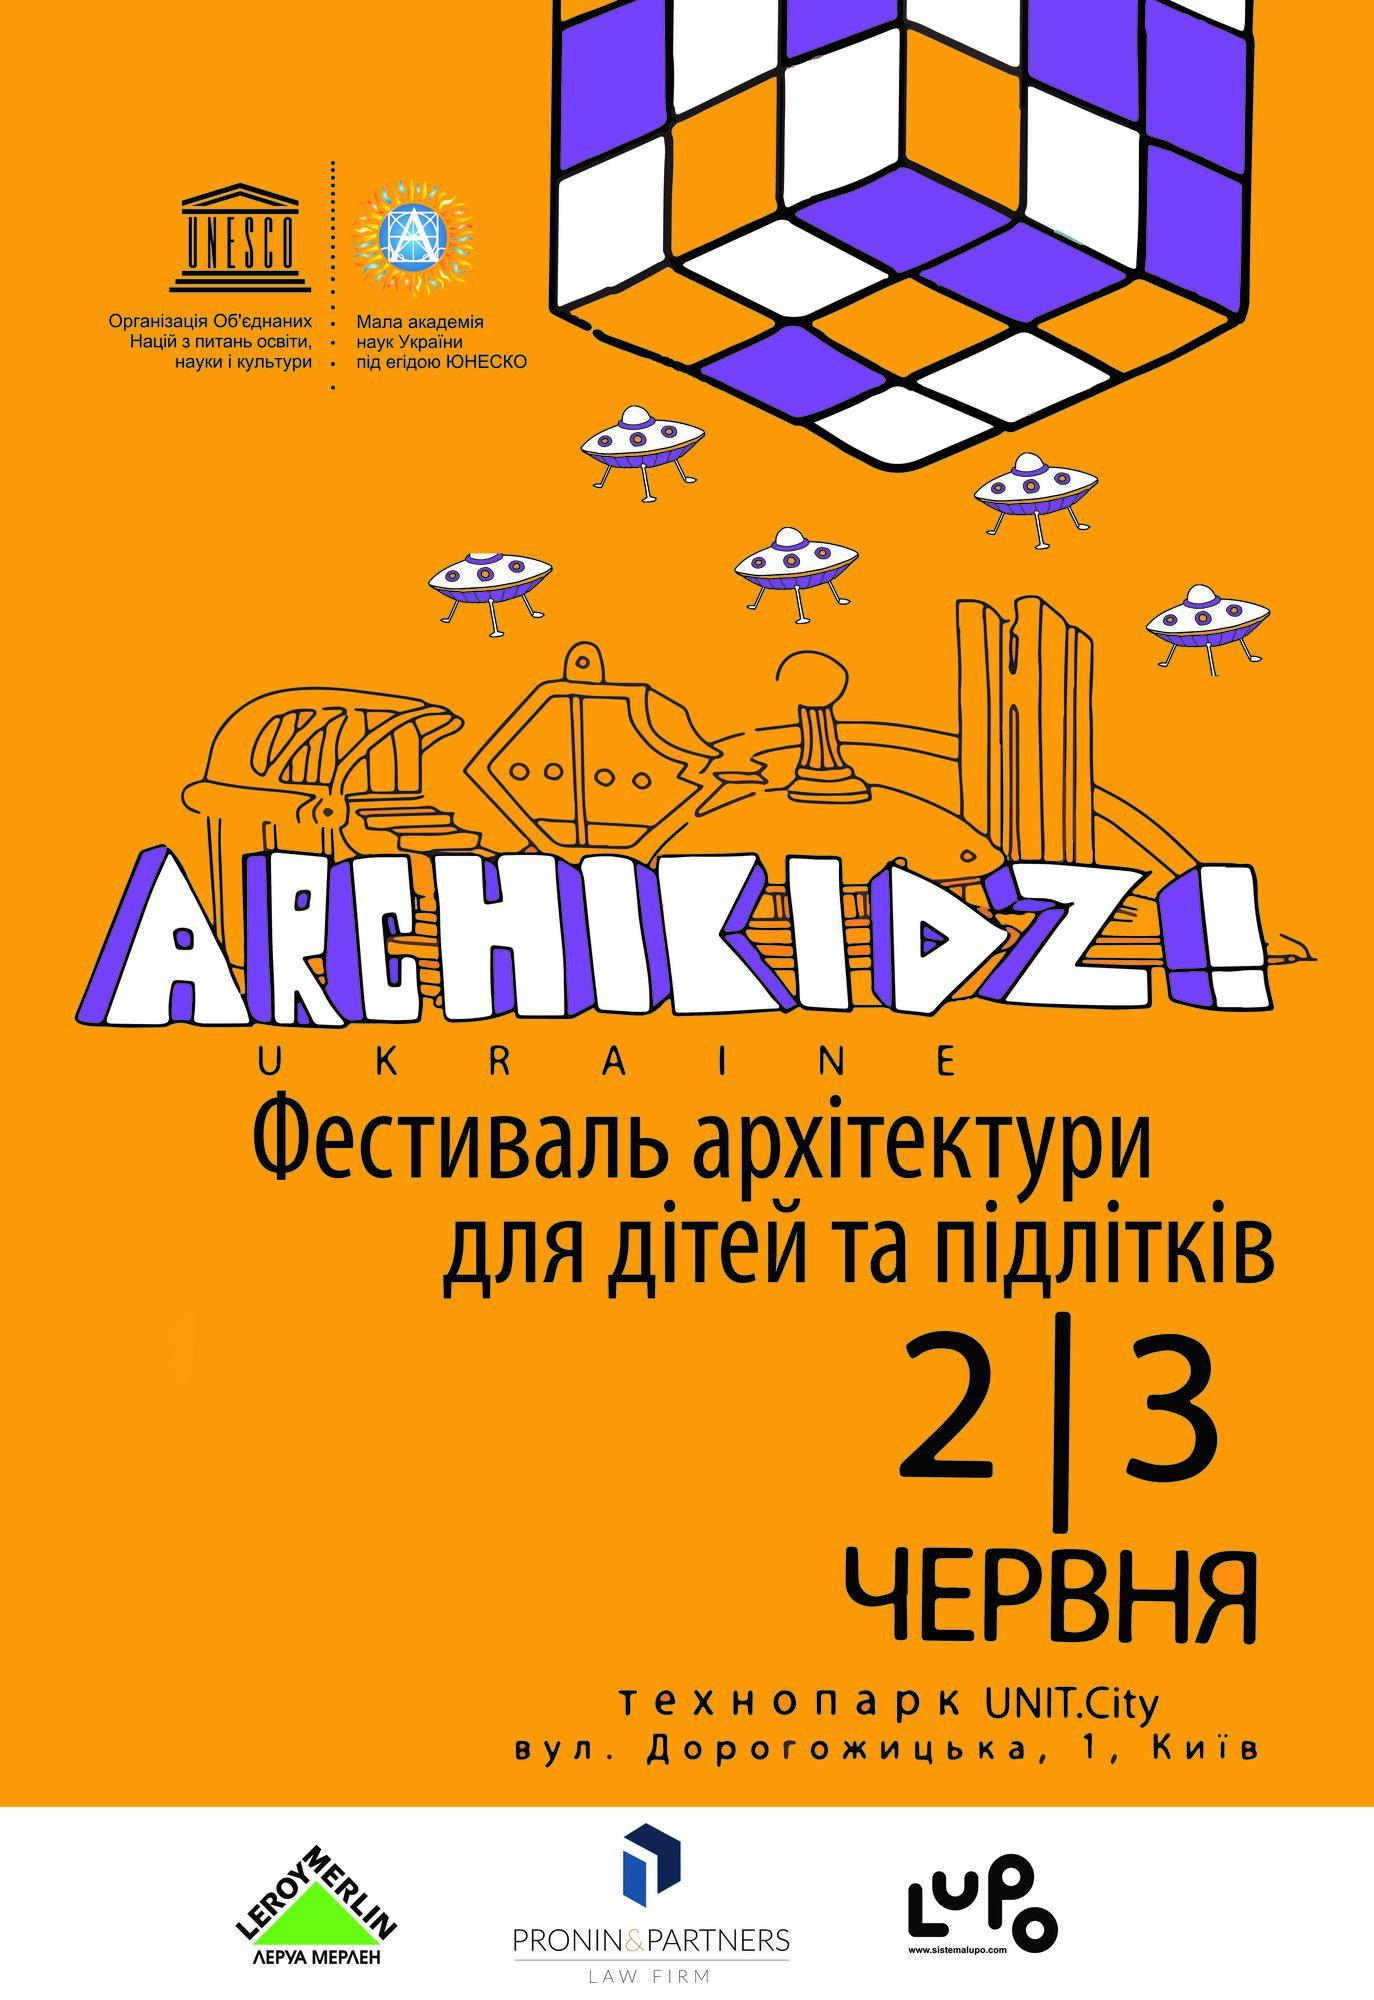 Archikidz! в Киеве: программа фестиваля